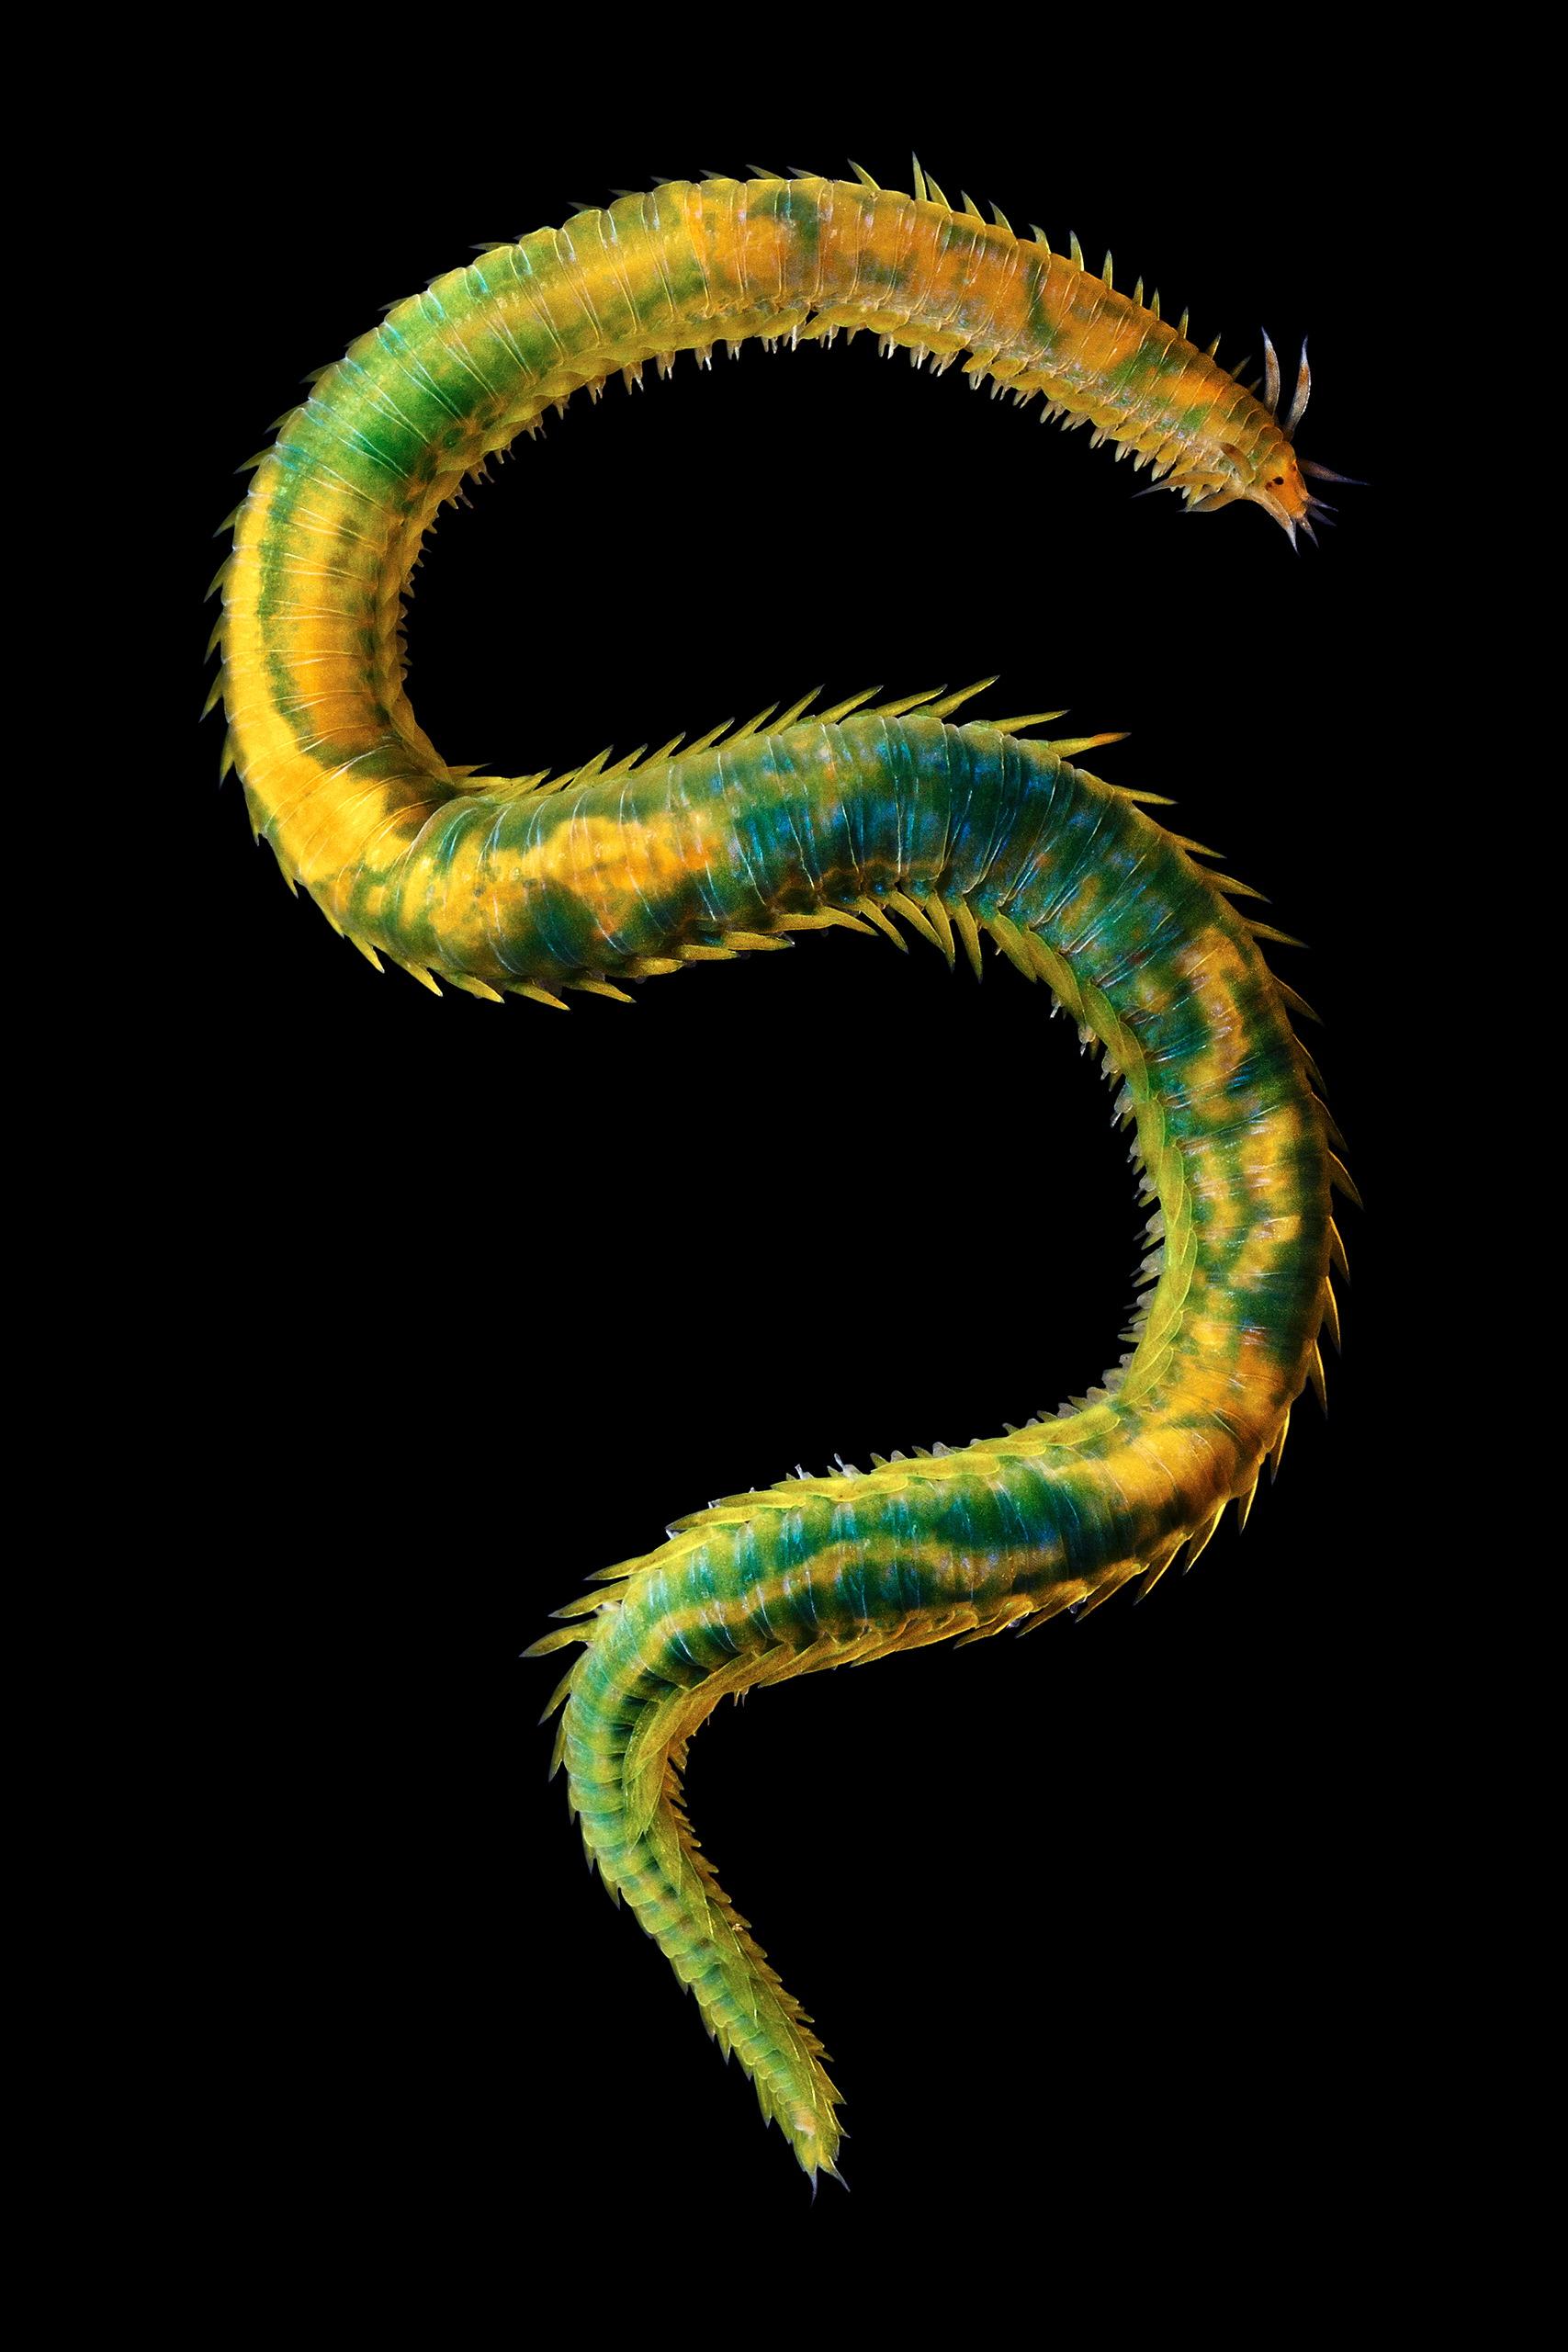 Polychaete – Eulalia viridis